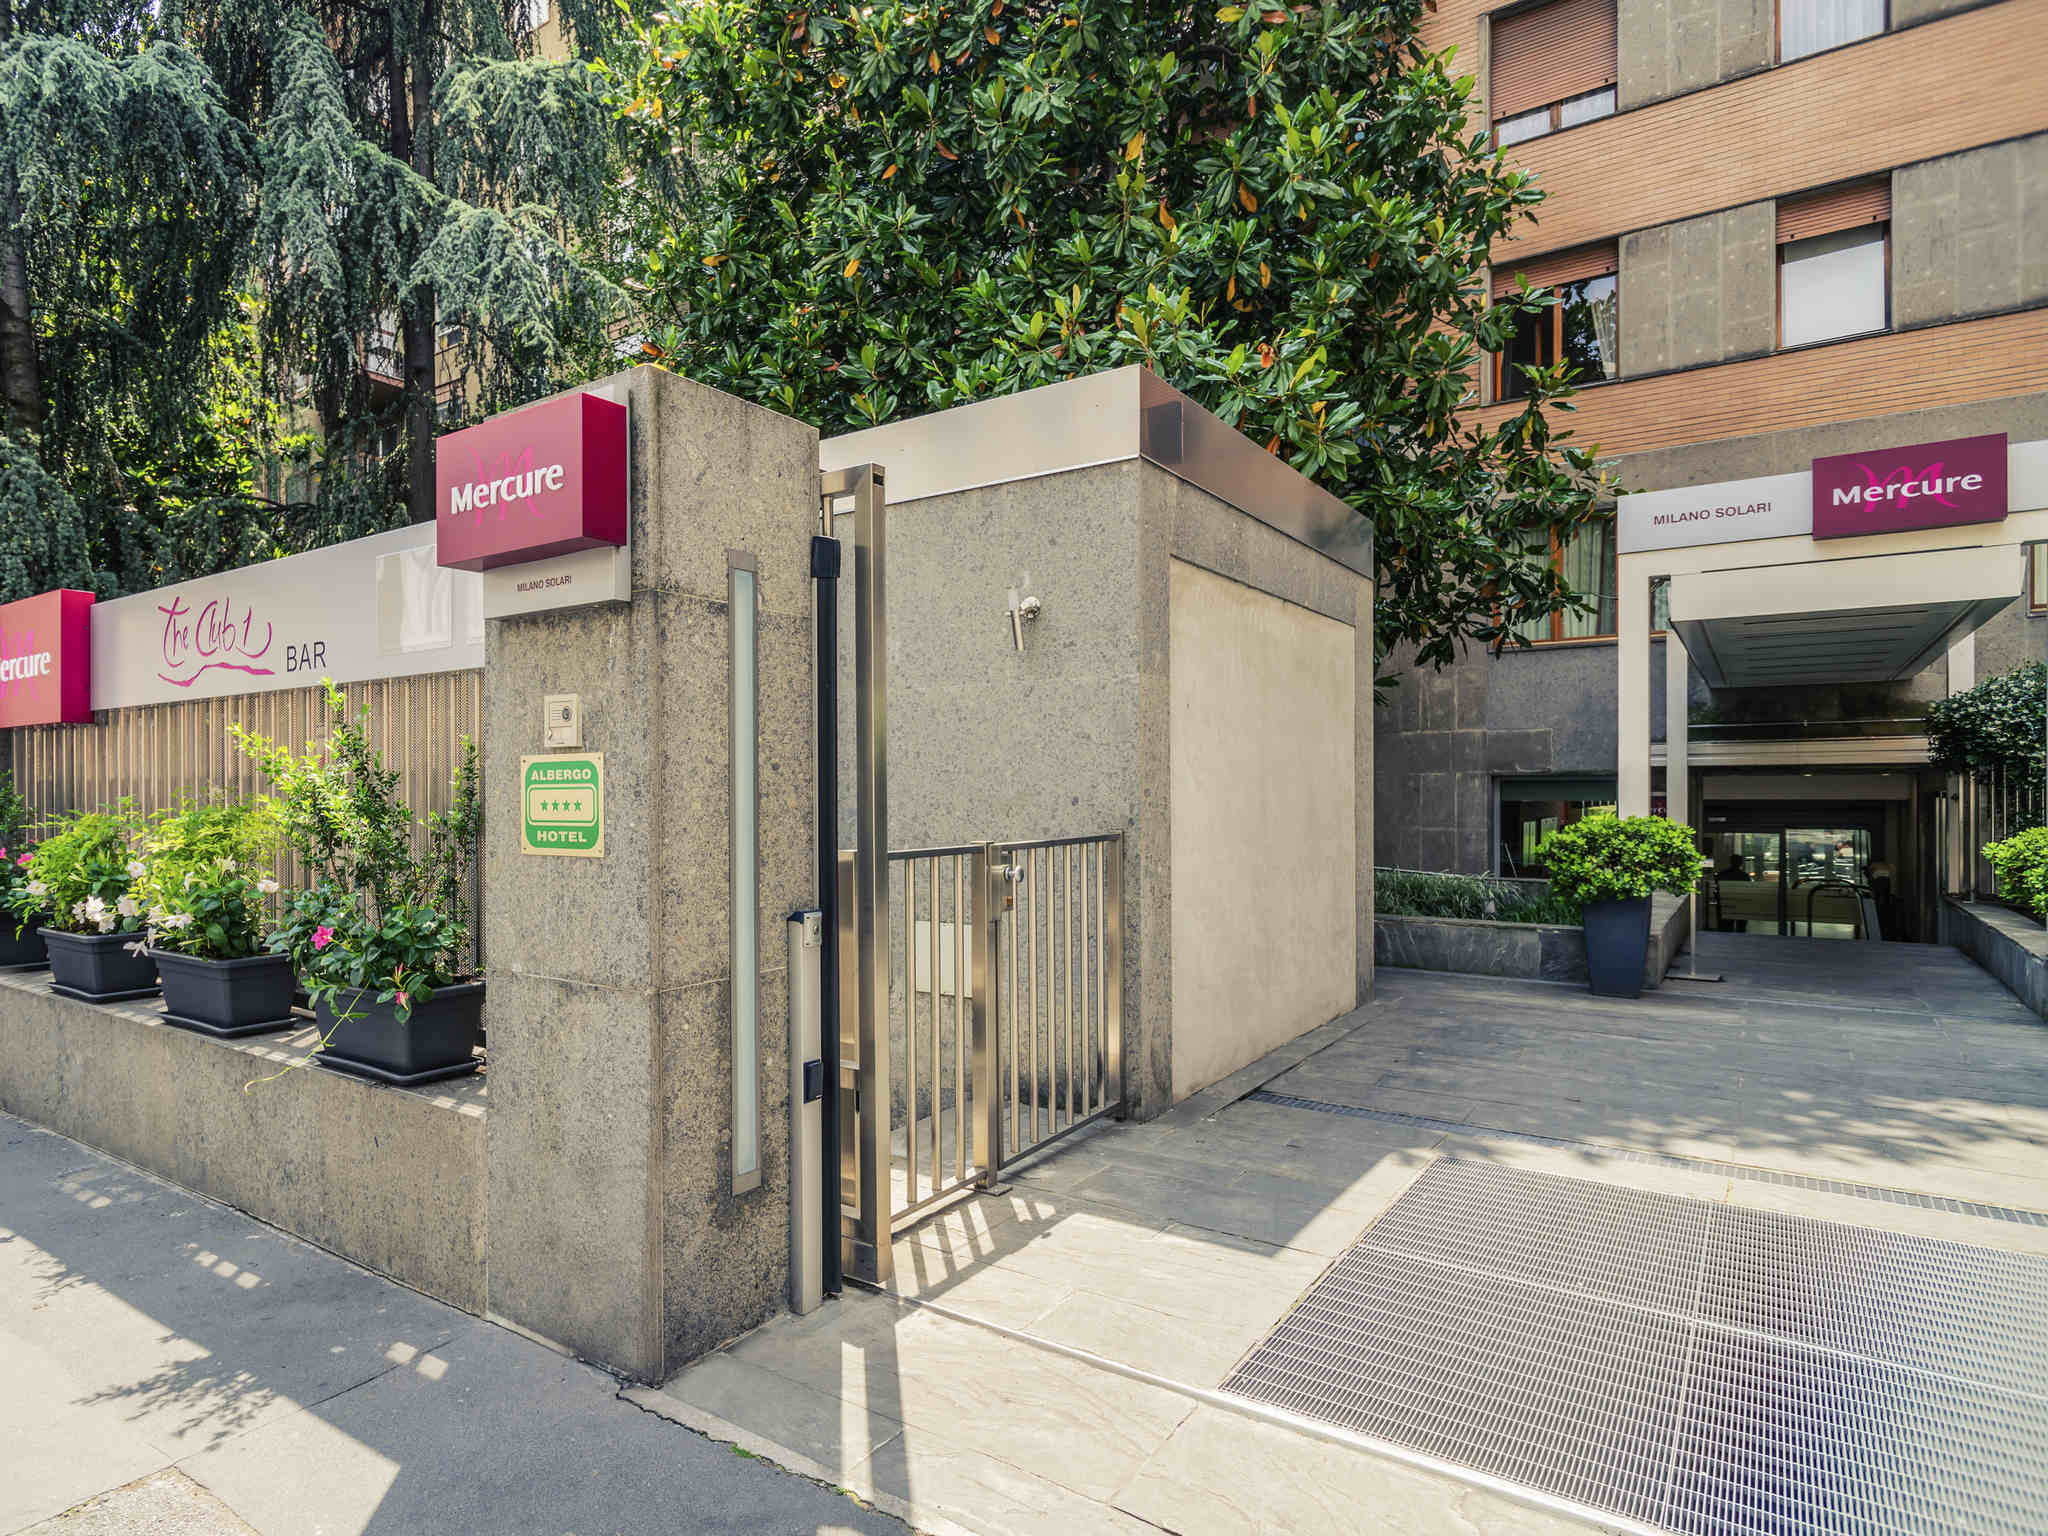 Hotel - Mercure Milano Solari